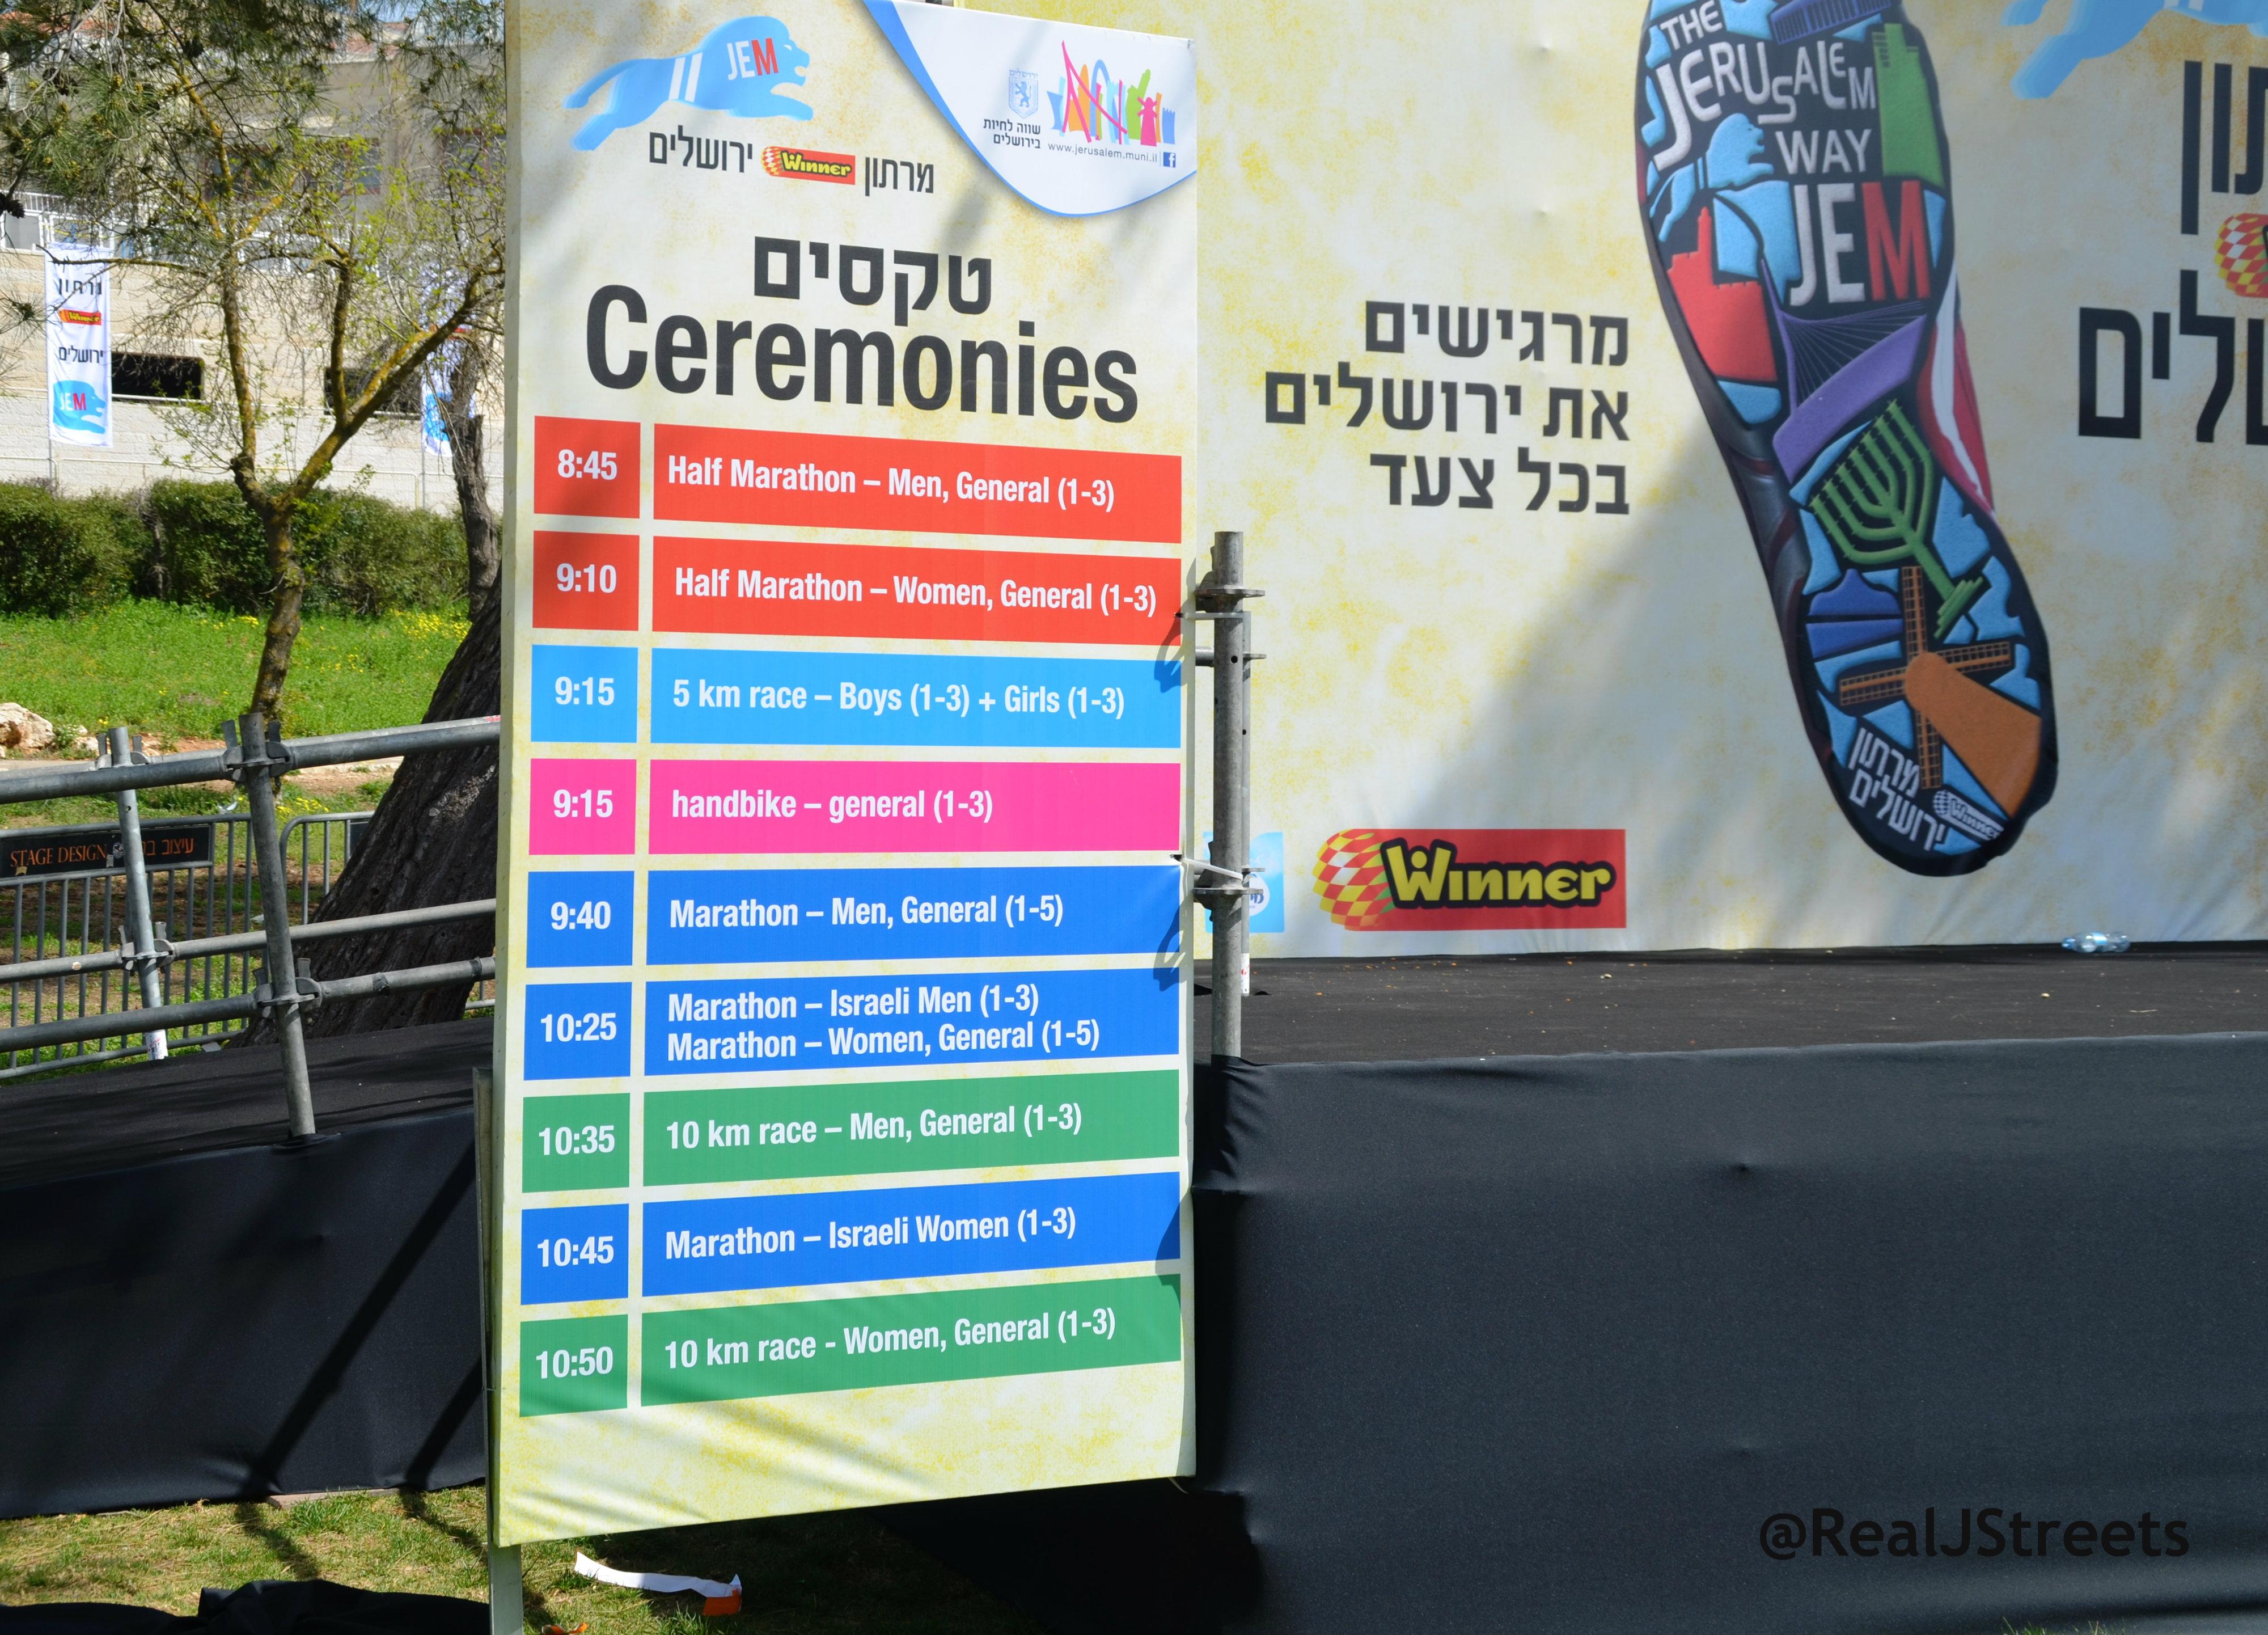 Sports Marathon ceremonies